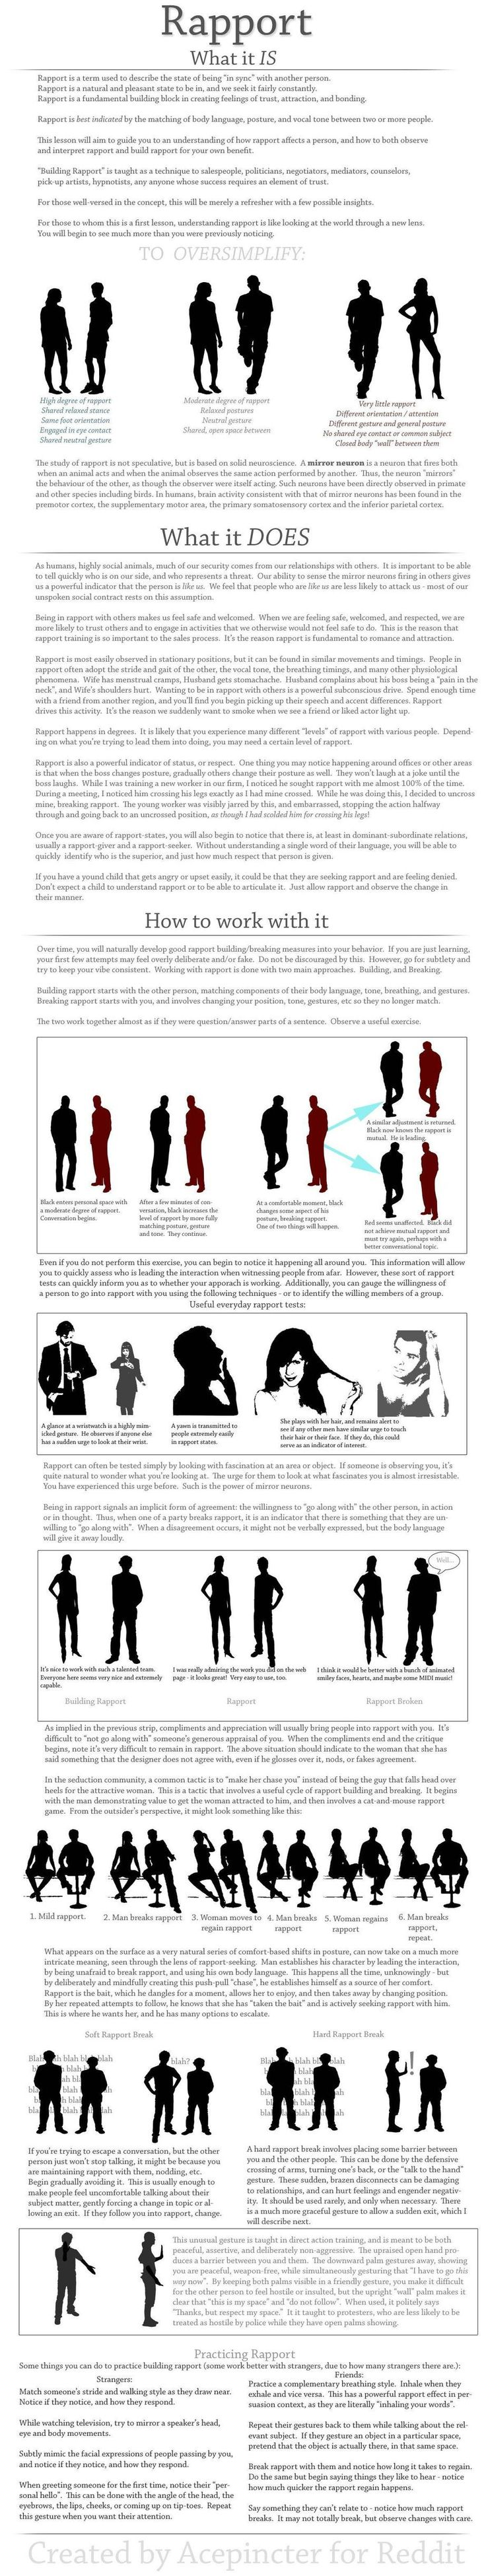 Acepincter - Bodylanguage - Rapport